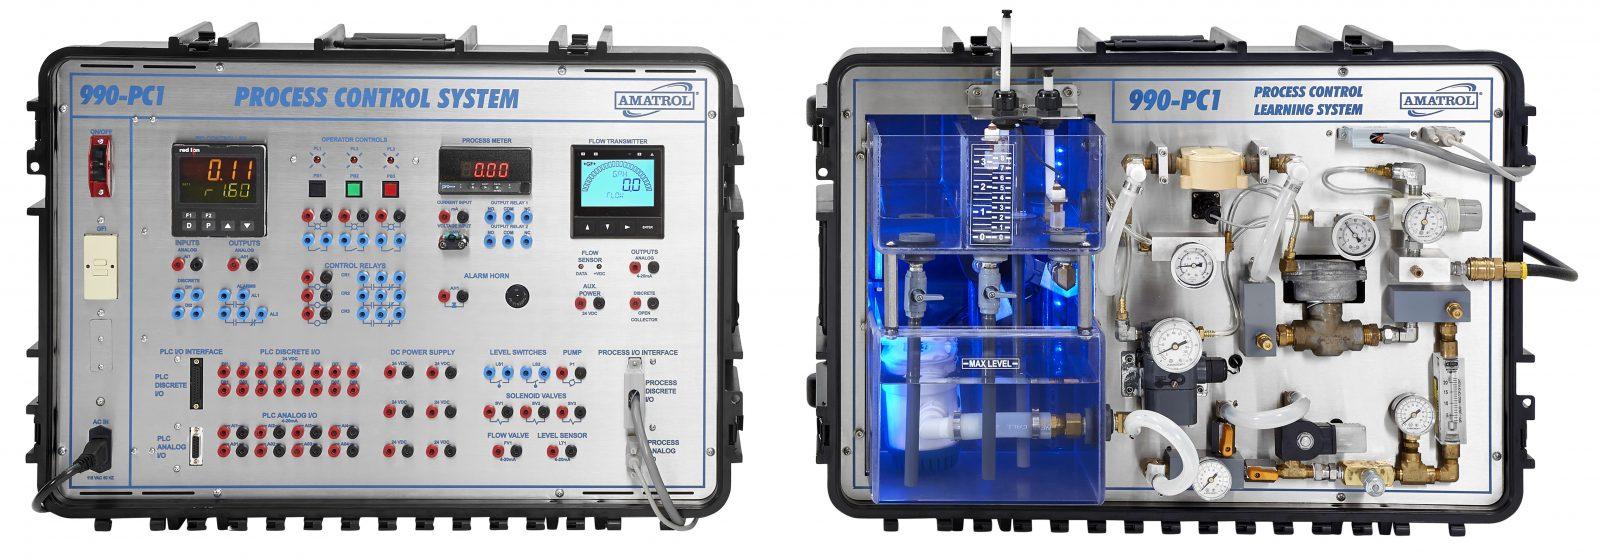 Amatrol portable process control trainer